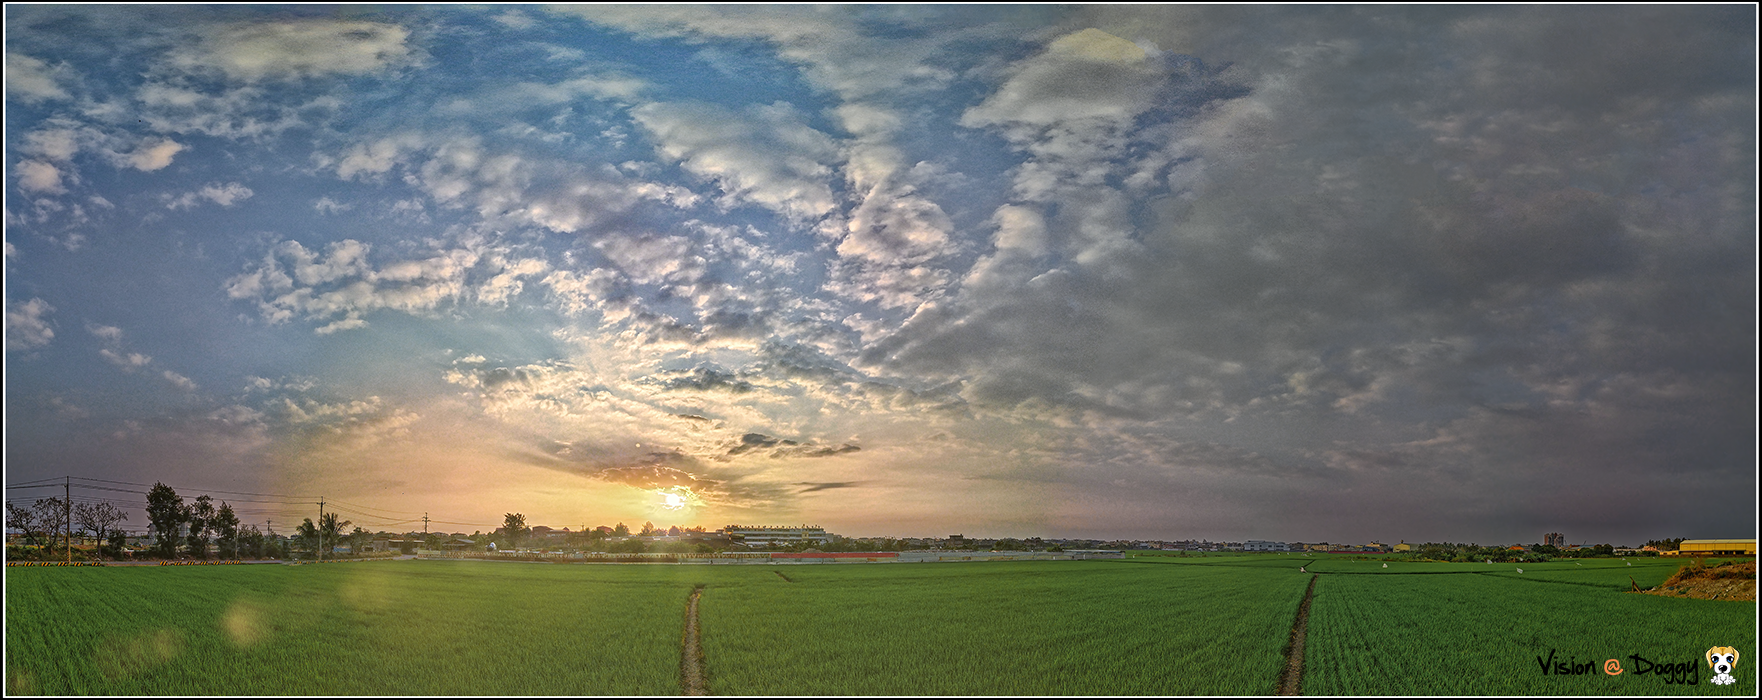 http://blog.hunternet.com.tw/wp-content/uploads/2020/02/pic-20200227-01-sunset.png